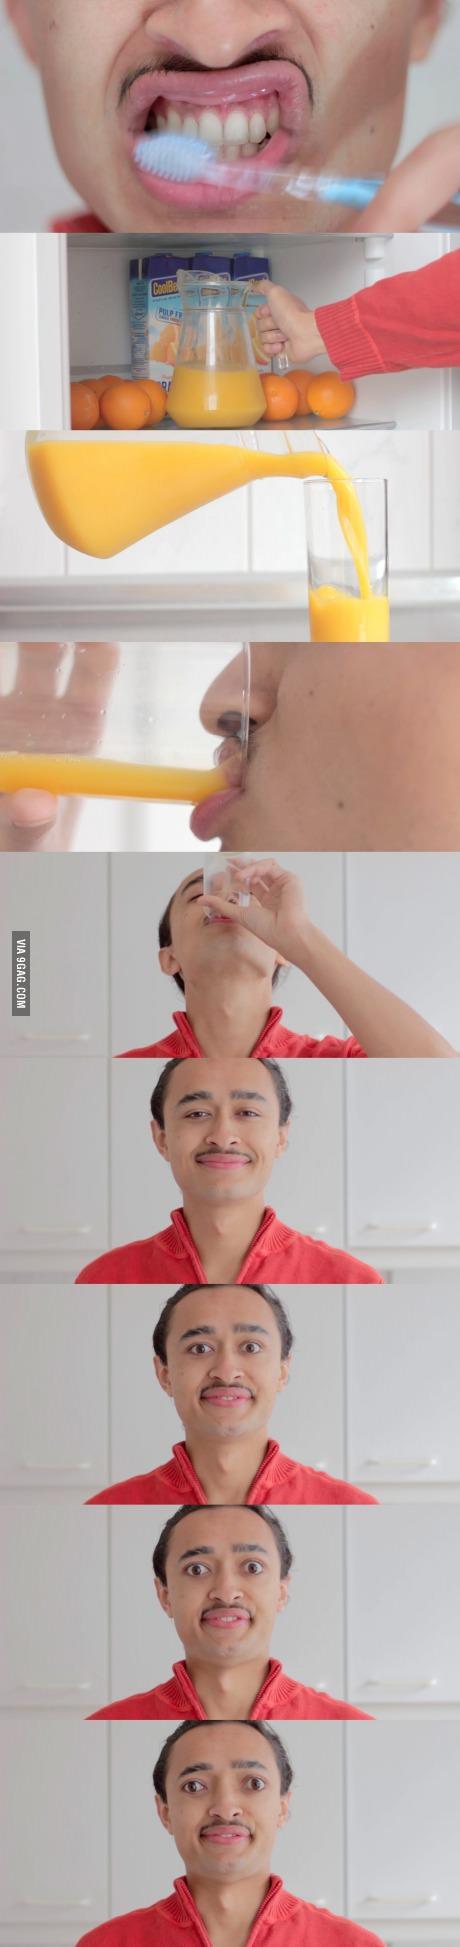 Toothpaste and orange juice. Don't do it.